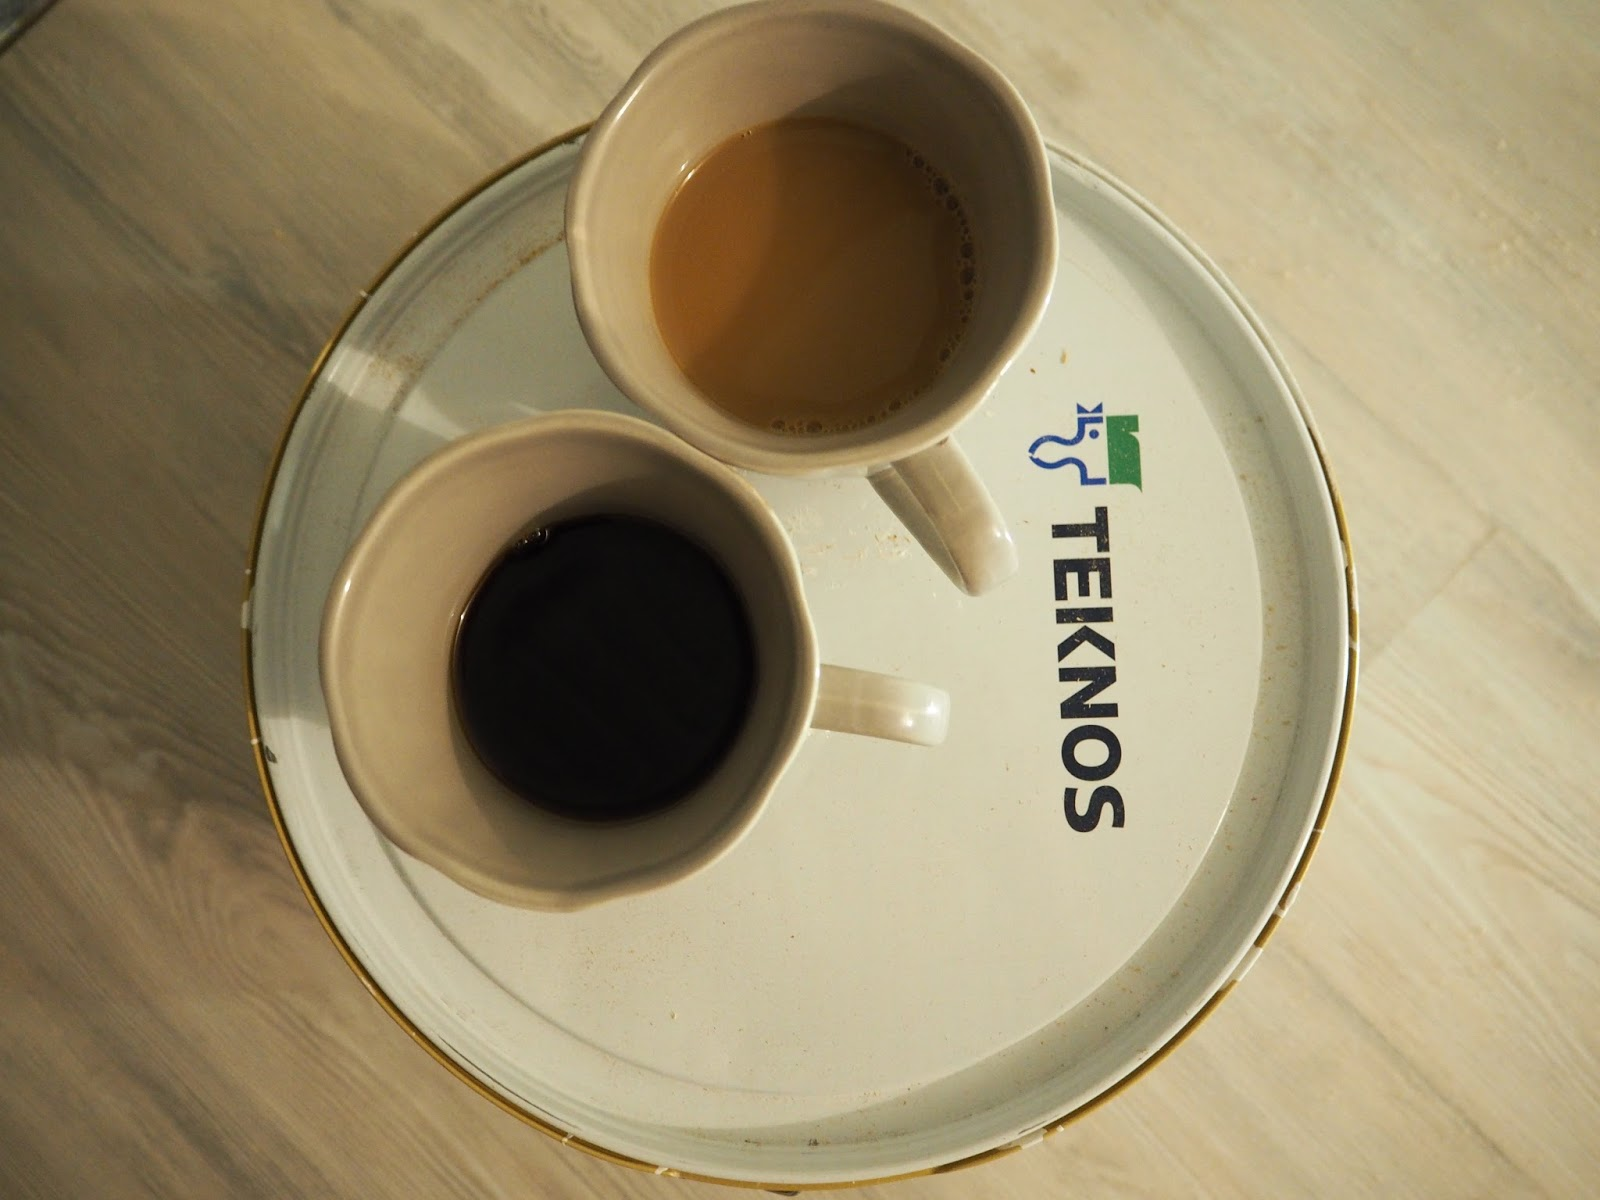 teknos maalit ja kahvitauko